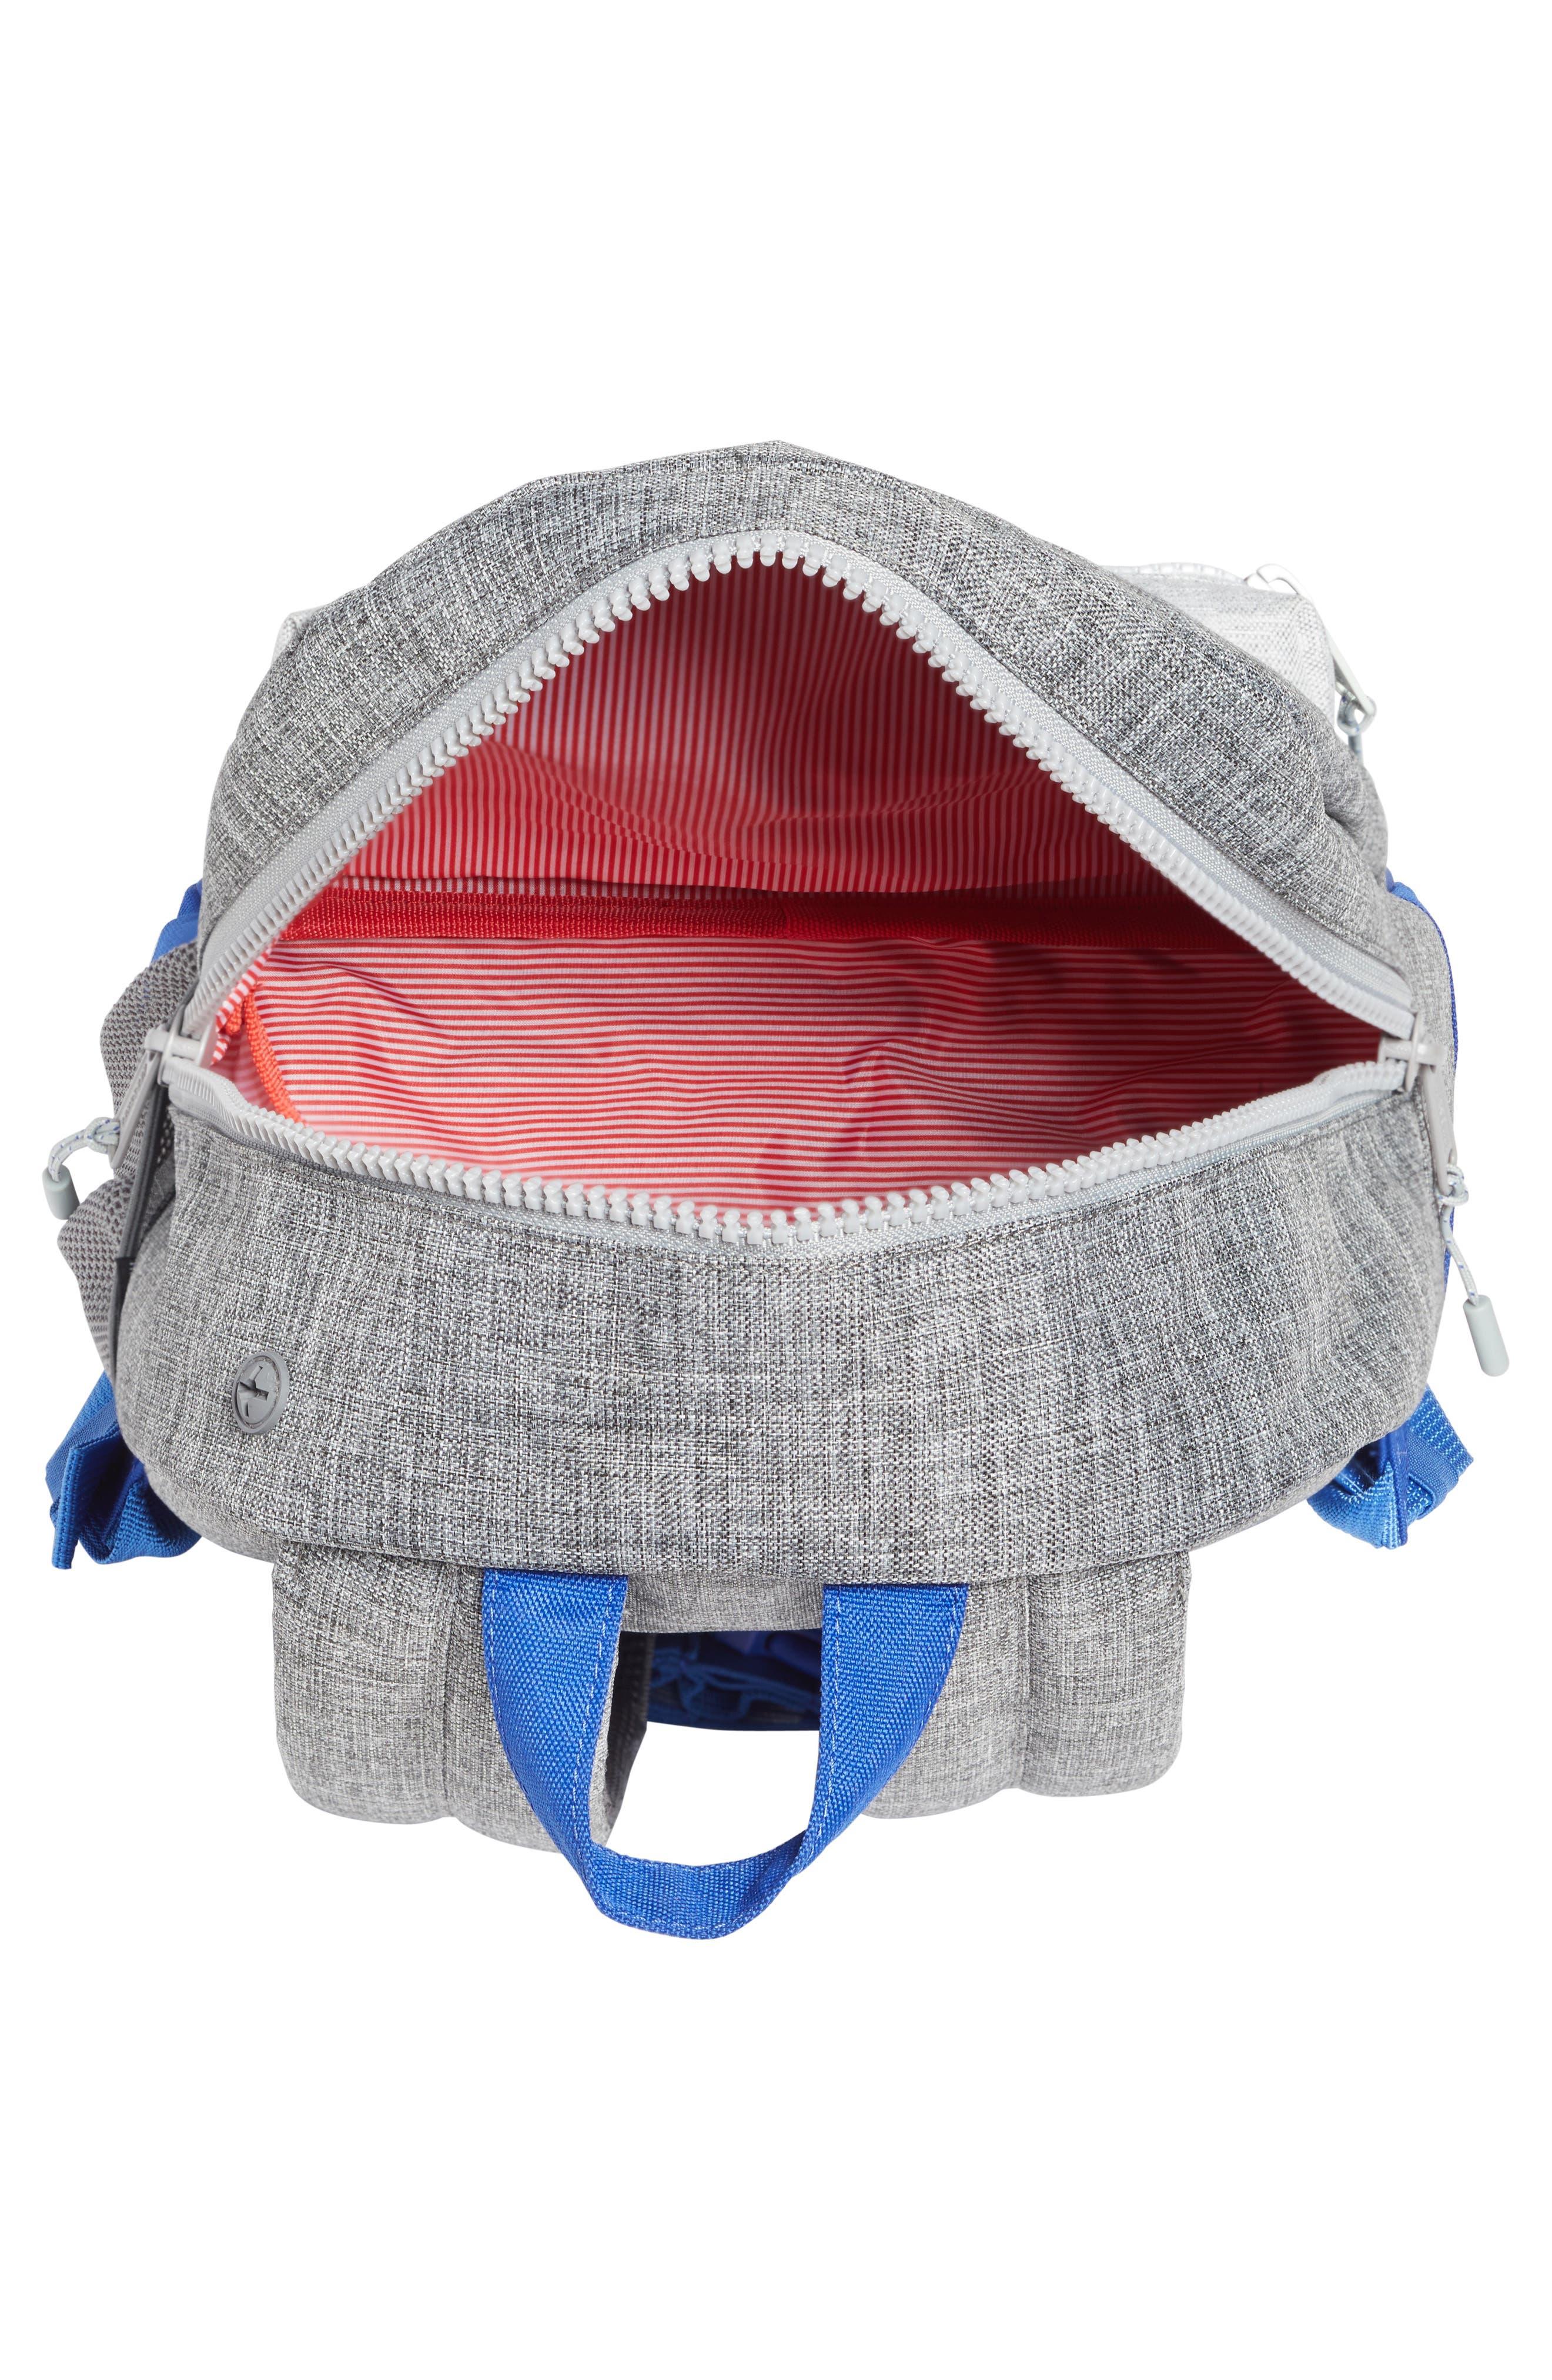 Heritage Colorblocked Backpack,                             Alternate thumbnail 3, color,                             Raven Crosshatch/ Surf Blue